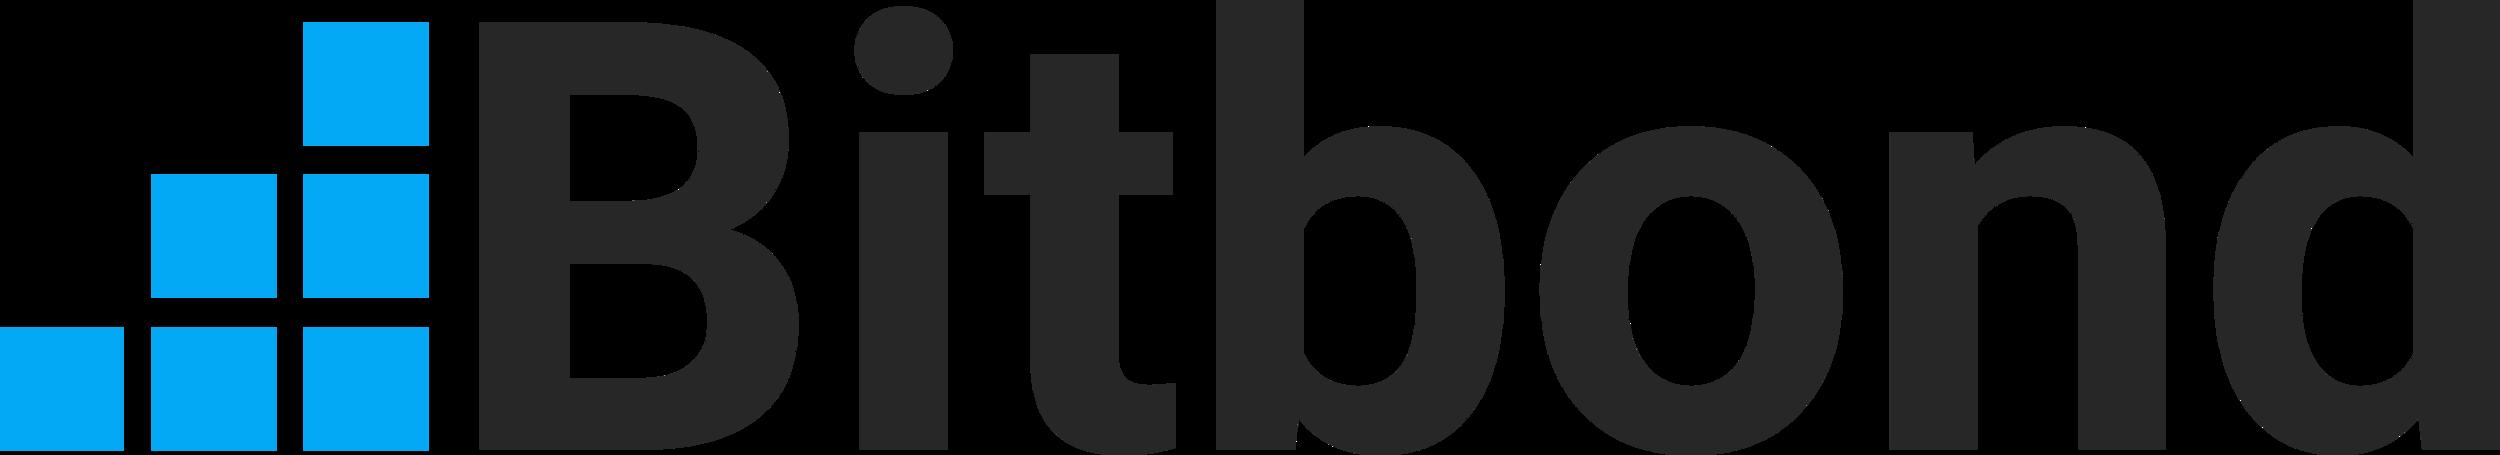 bitbond_logo.png